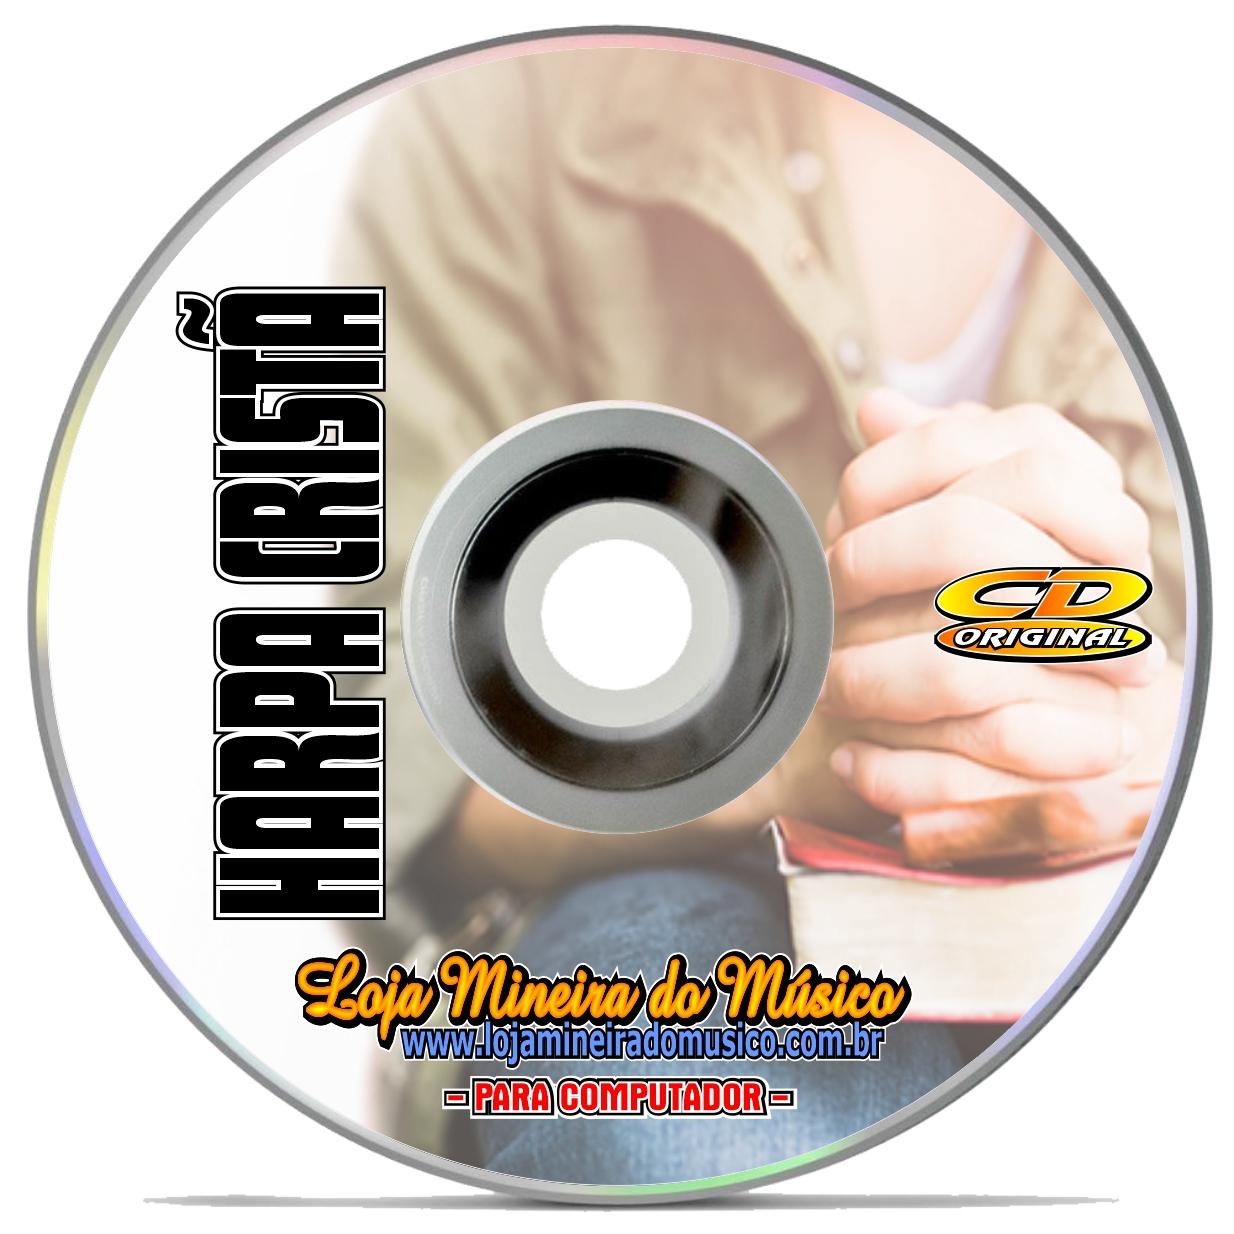 harpa cristã partituras em PDF para baixar partituras harpa